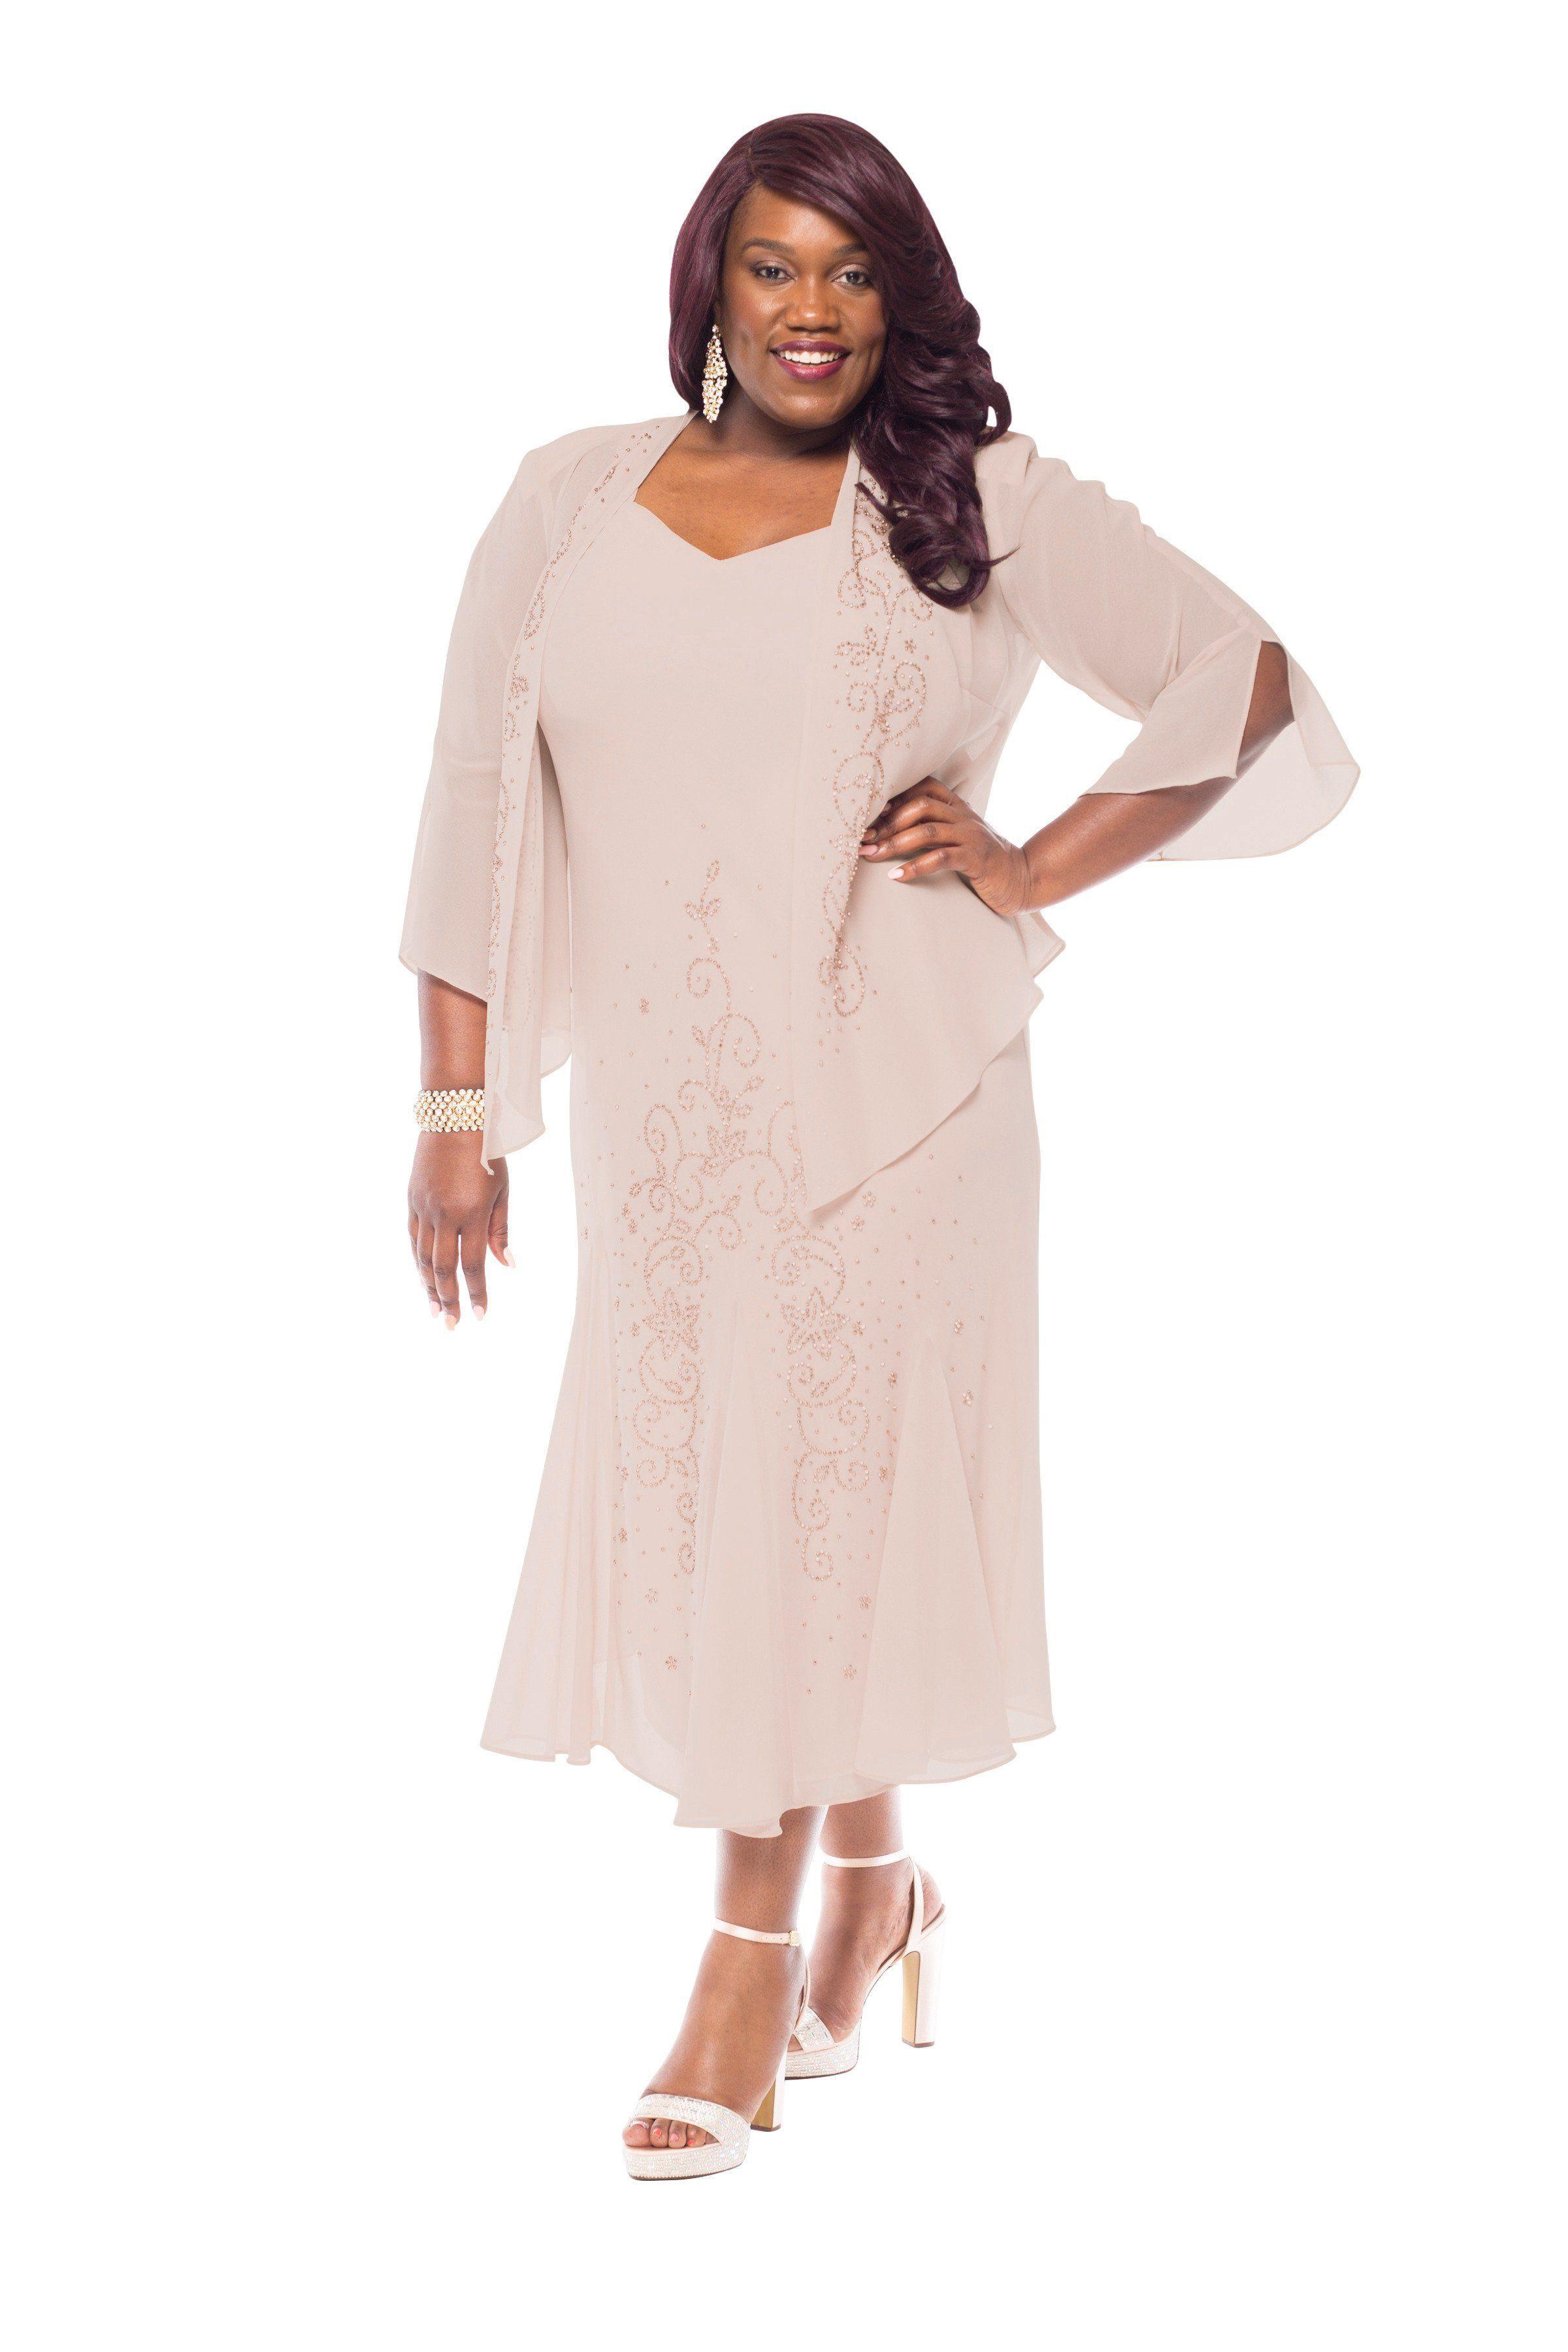 Women/'s Plus Size Beaded Jacket Dress Mother of the Bride Dresses Tea Length